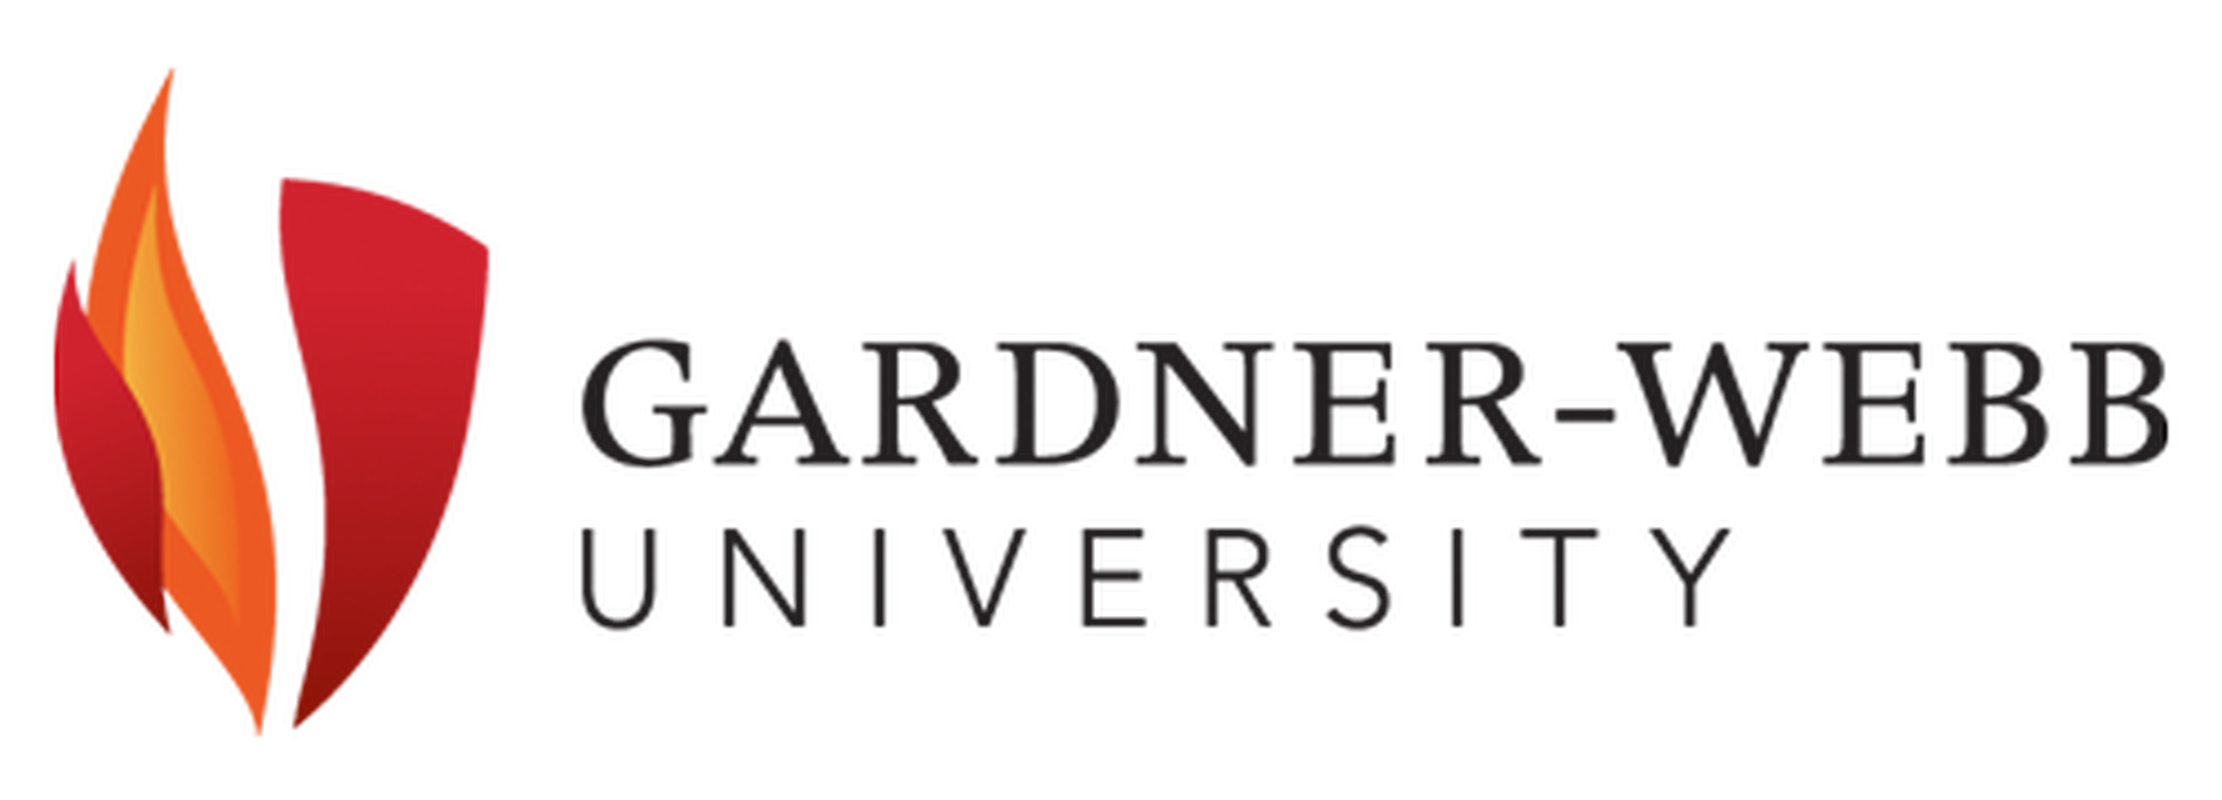 Gardner-Webb-University-7.png